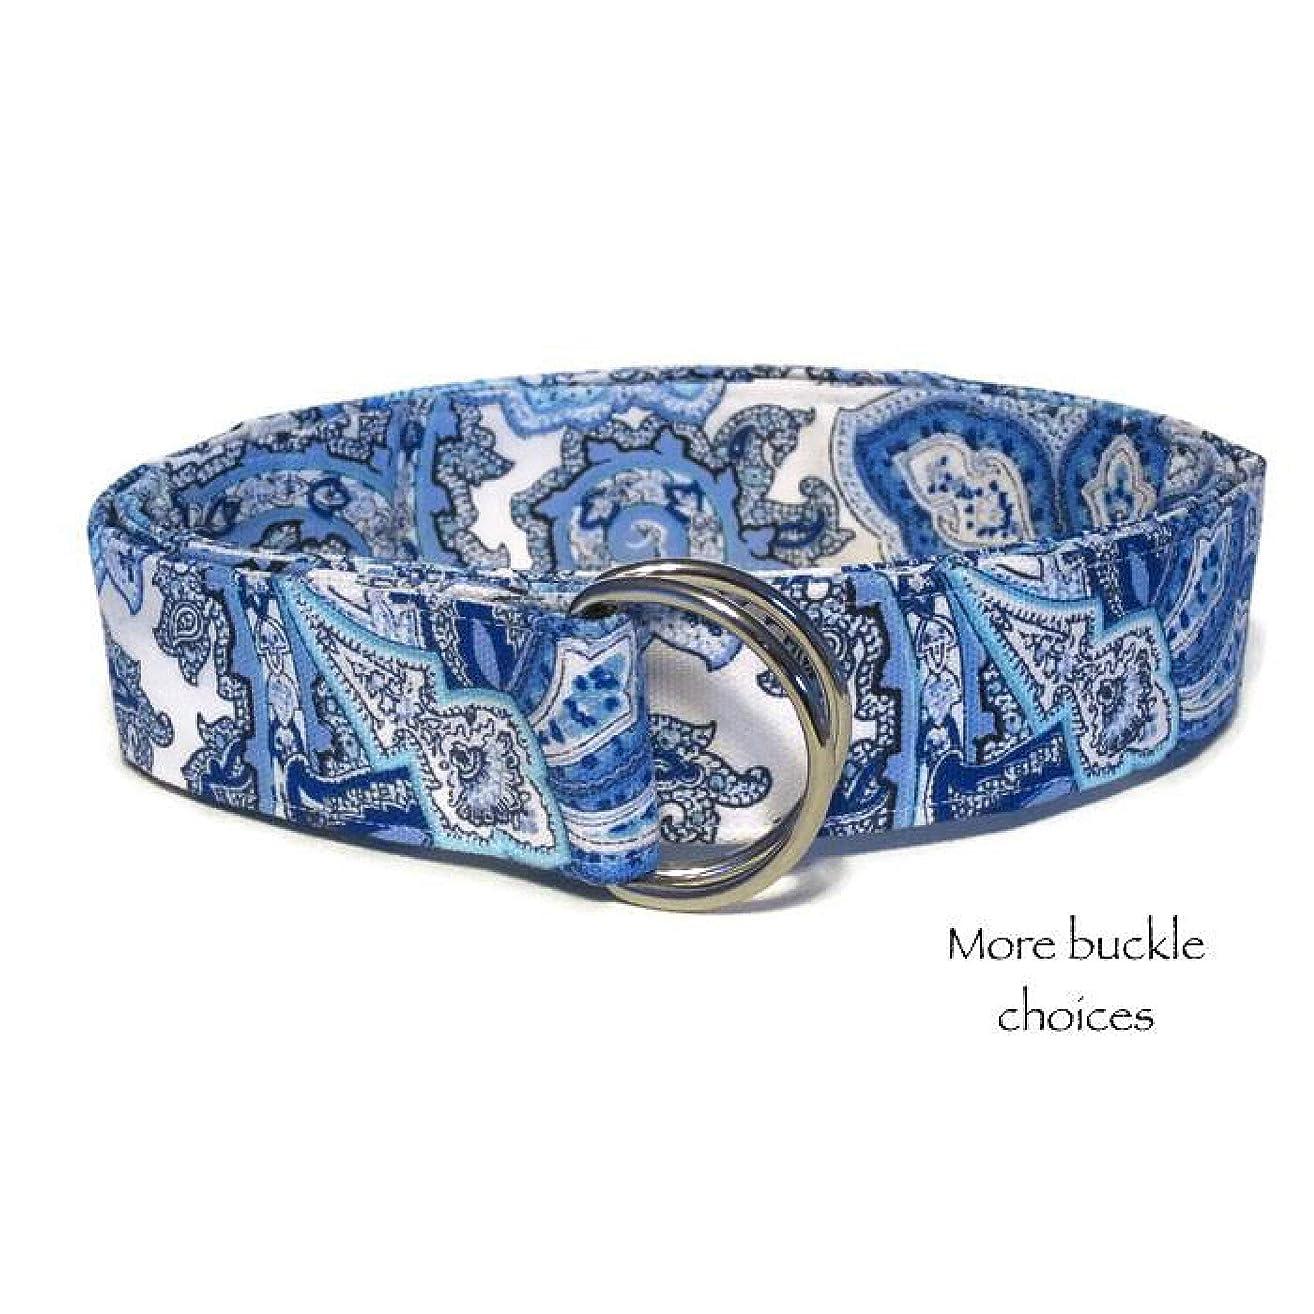 Women's Fabric Belt/Blue Belt/Women's D-ring Belt/Blue and White Paisley Fabric Belt/Wide Belt Skinny Belt/Waist Belt/XS to Plus Size Belt